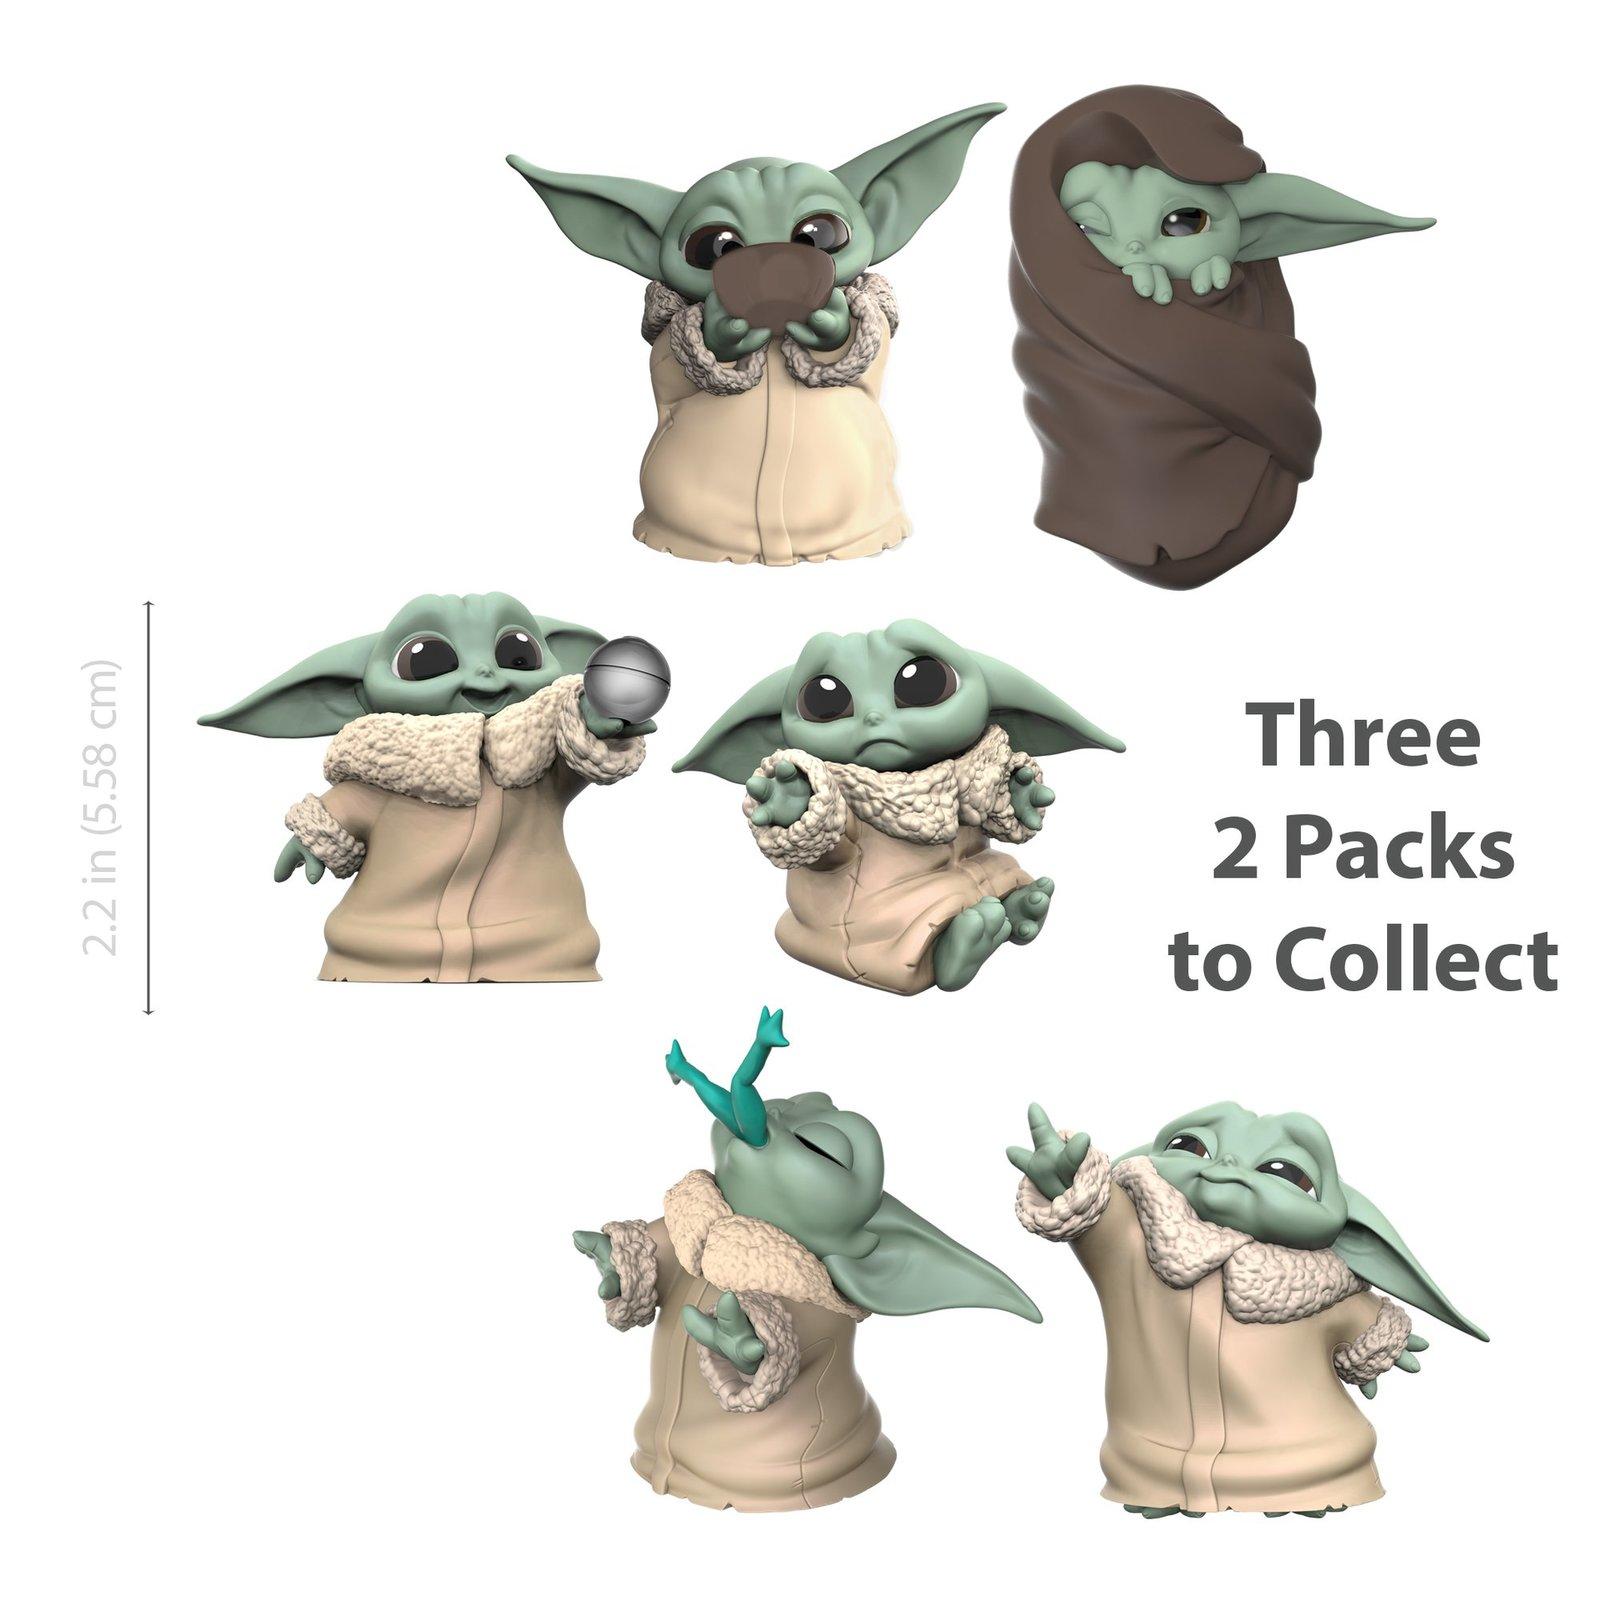 Star Wars: The Child - Holdme Balltoy image